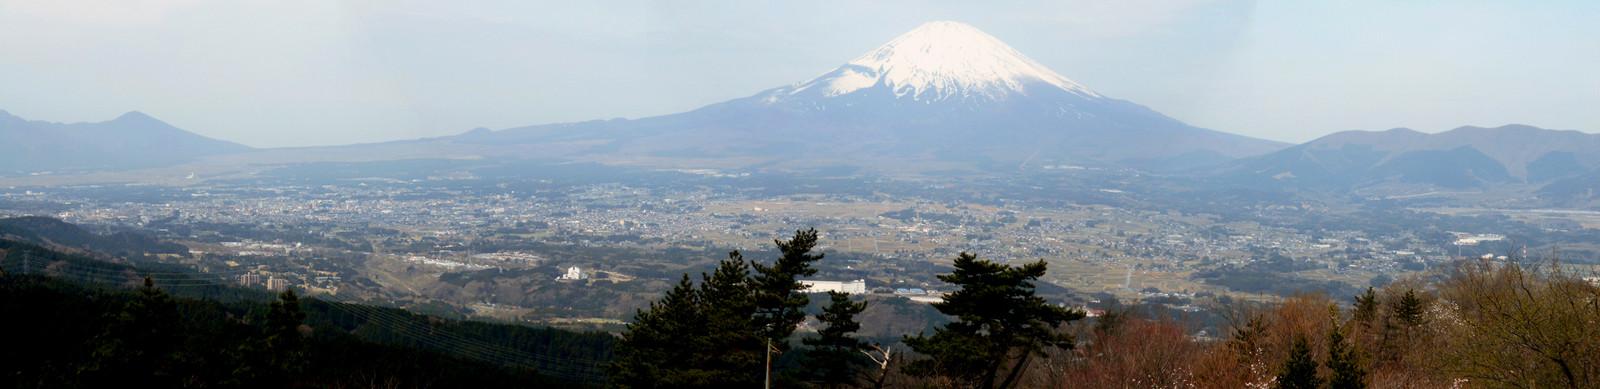 Panorama_ashigaratohge1s_3